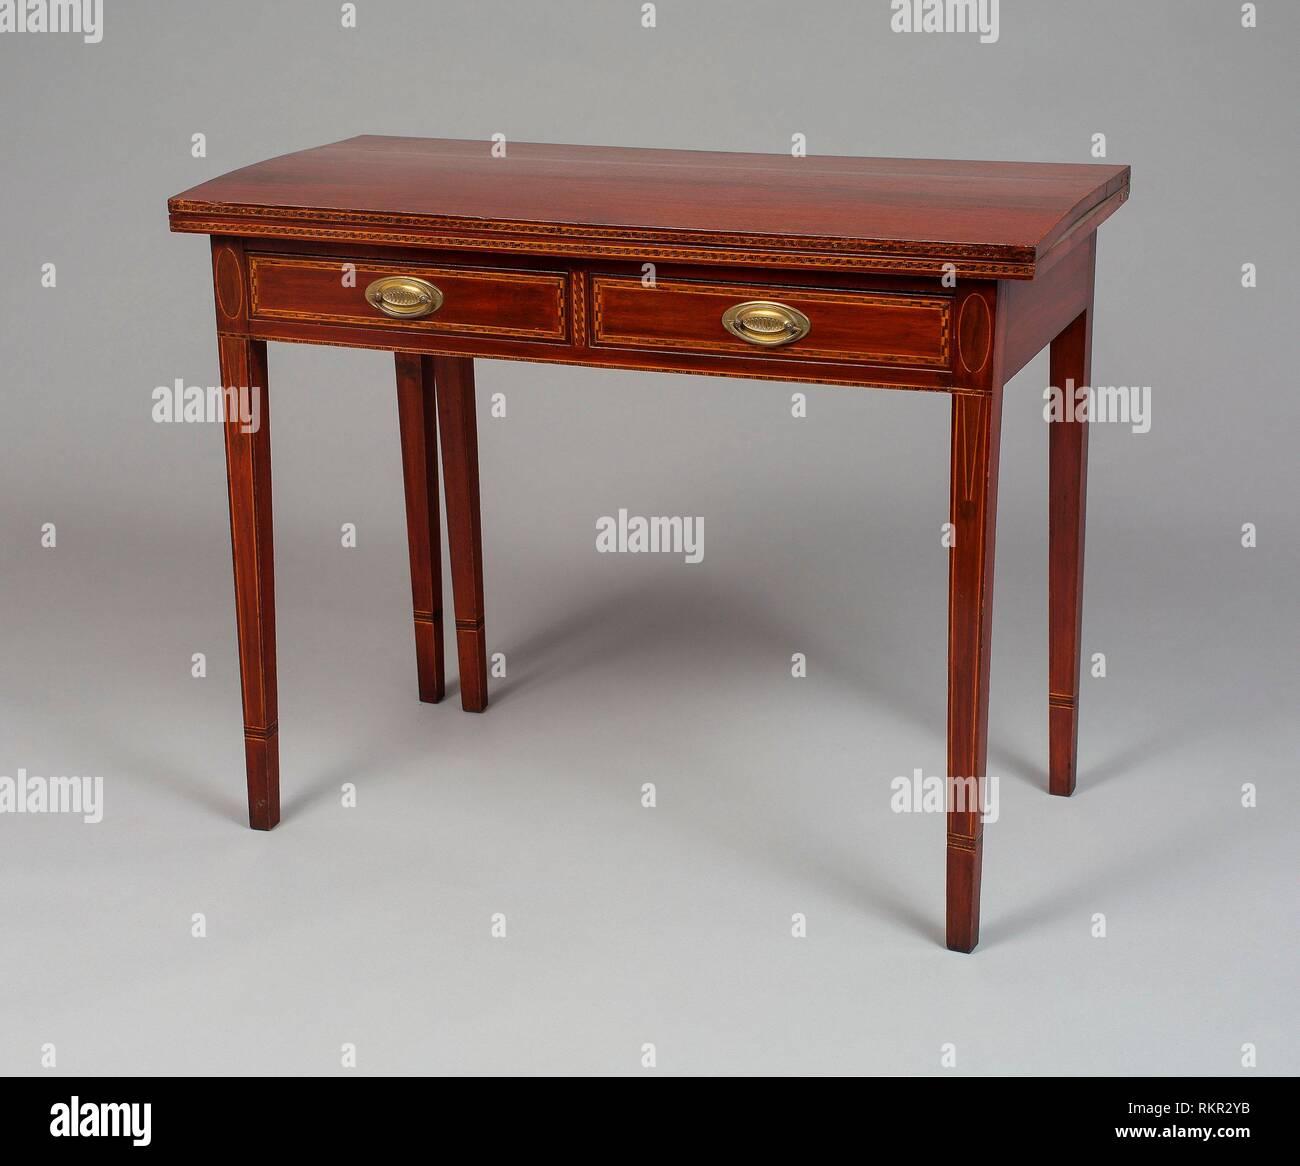 Peachy Card Table 1805 15 American Rutland Vermont Origin Uwap Interior Chair Design Uwaporg